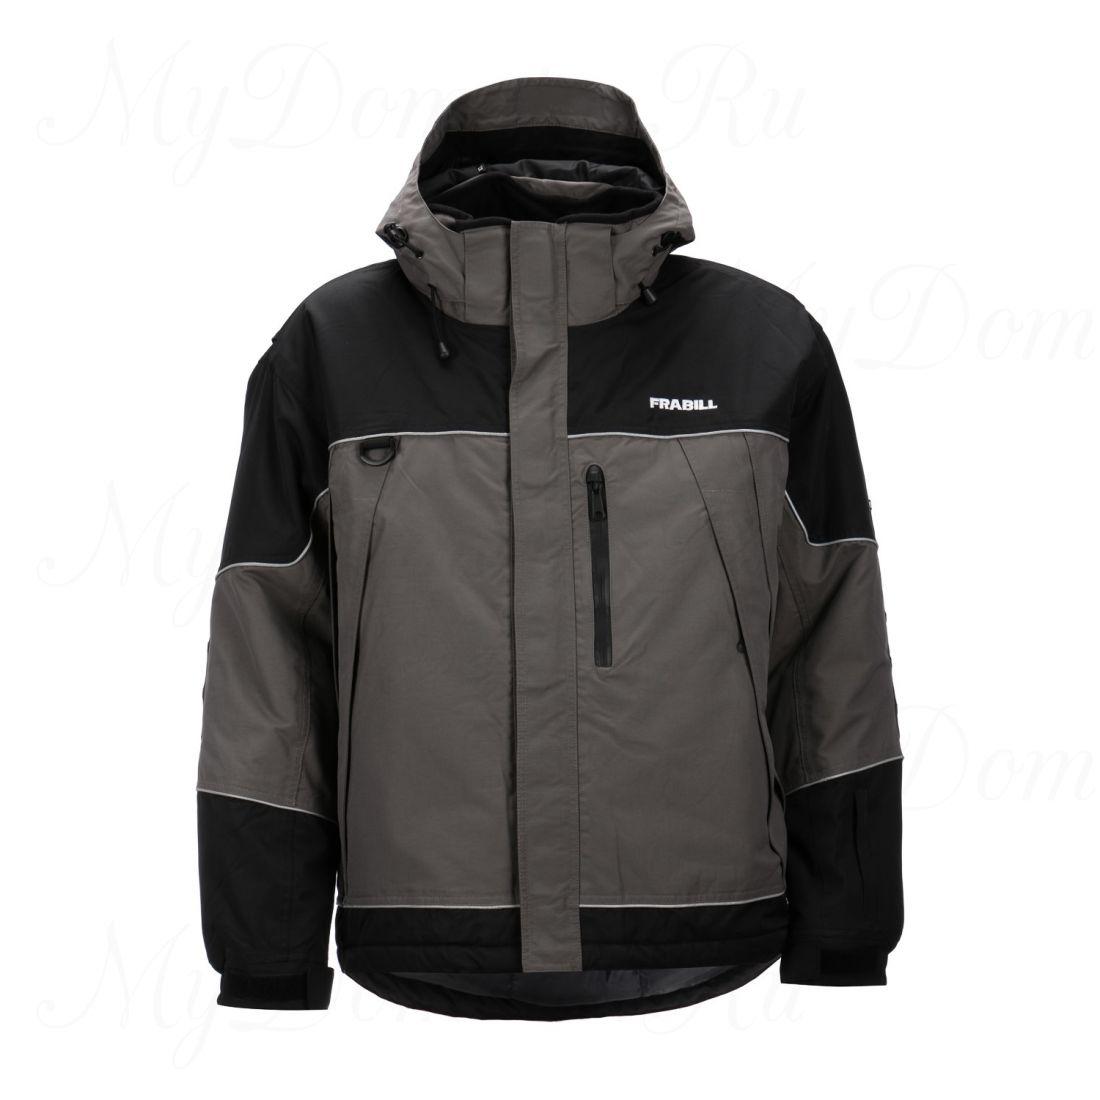 Куртка зимняя Frabill FXE SnoSuit Jacket Gray размер 2XL